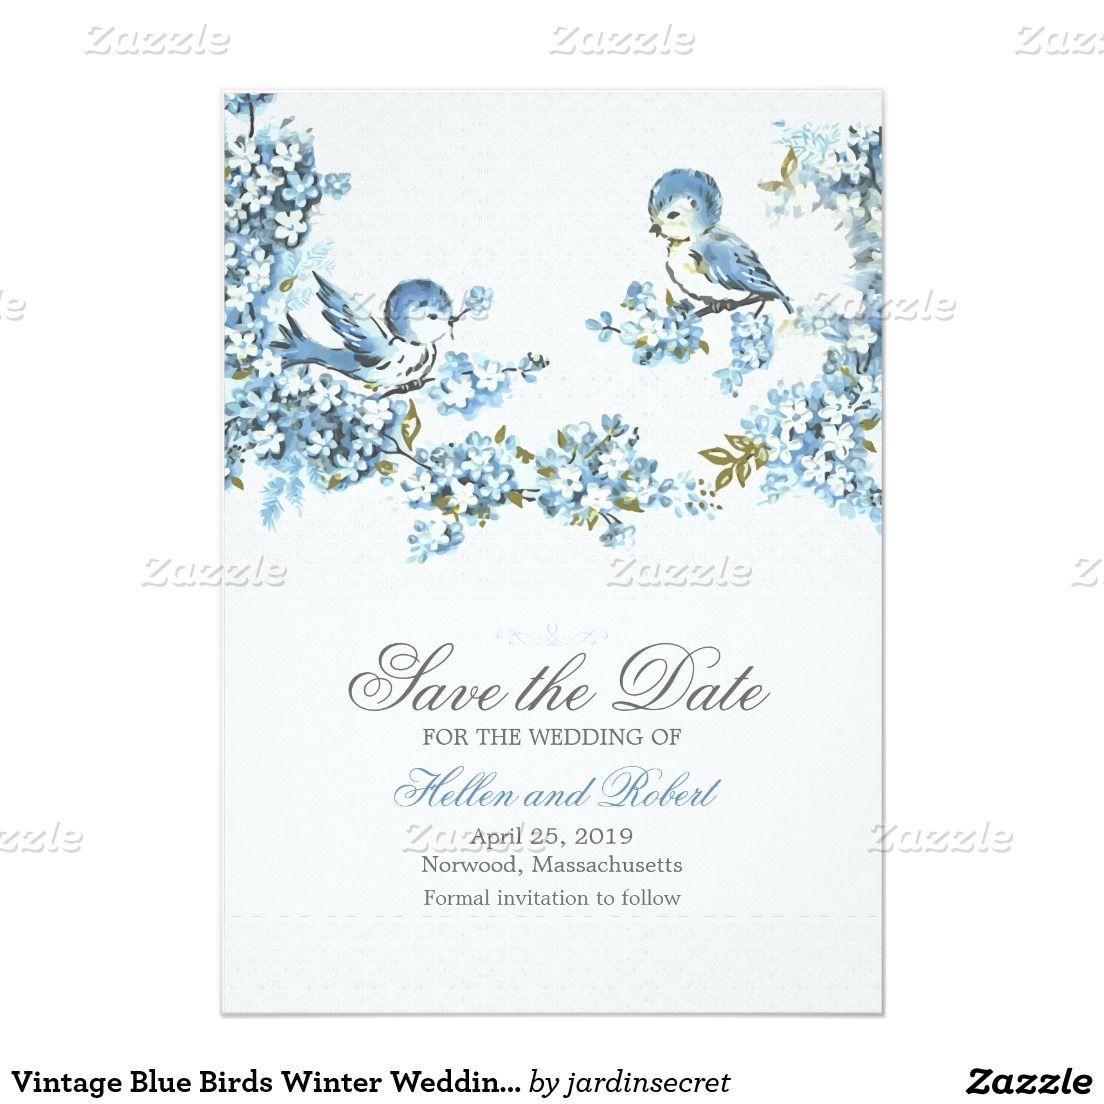 Vintage Blue Birds Winter Wedding Save the Date Card | website ...